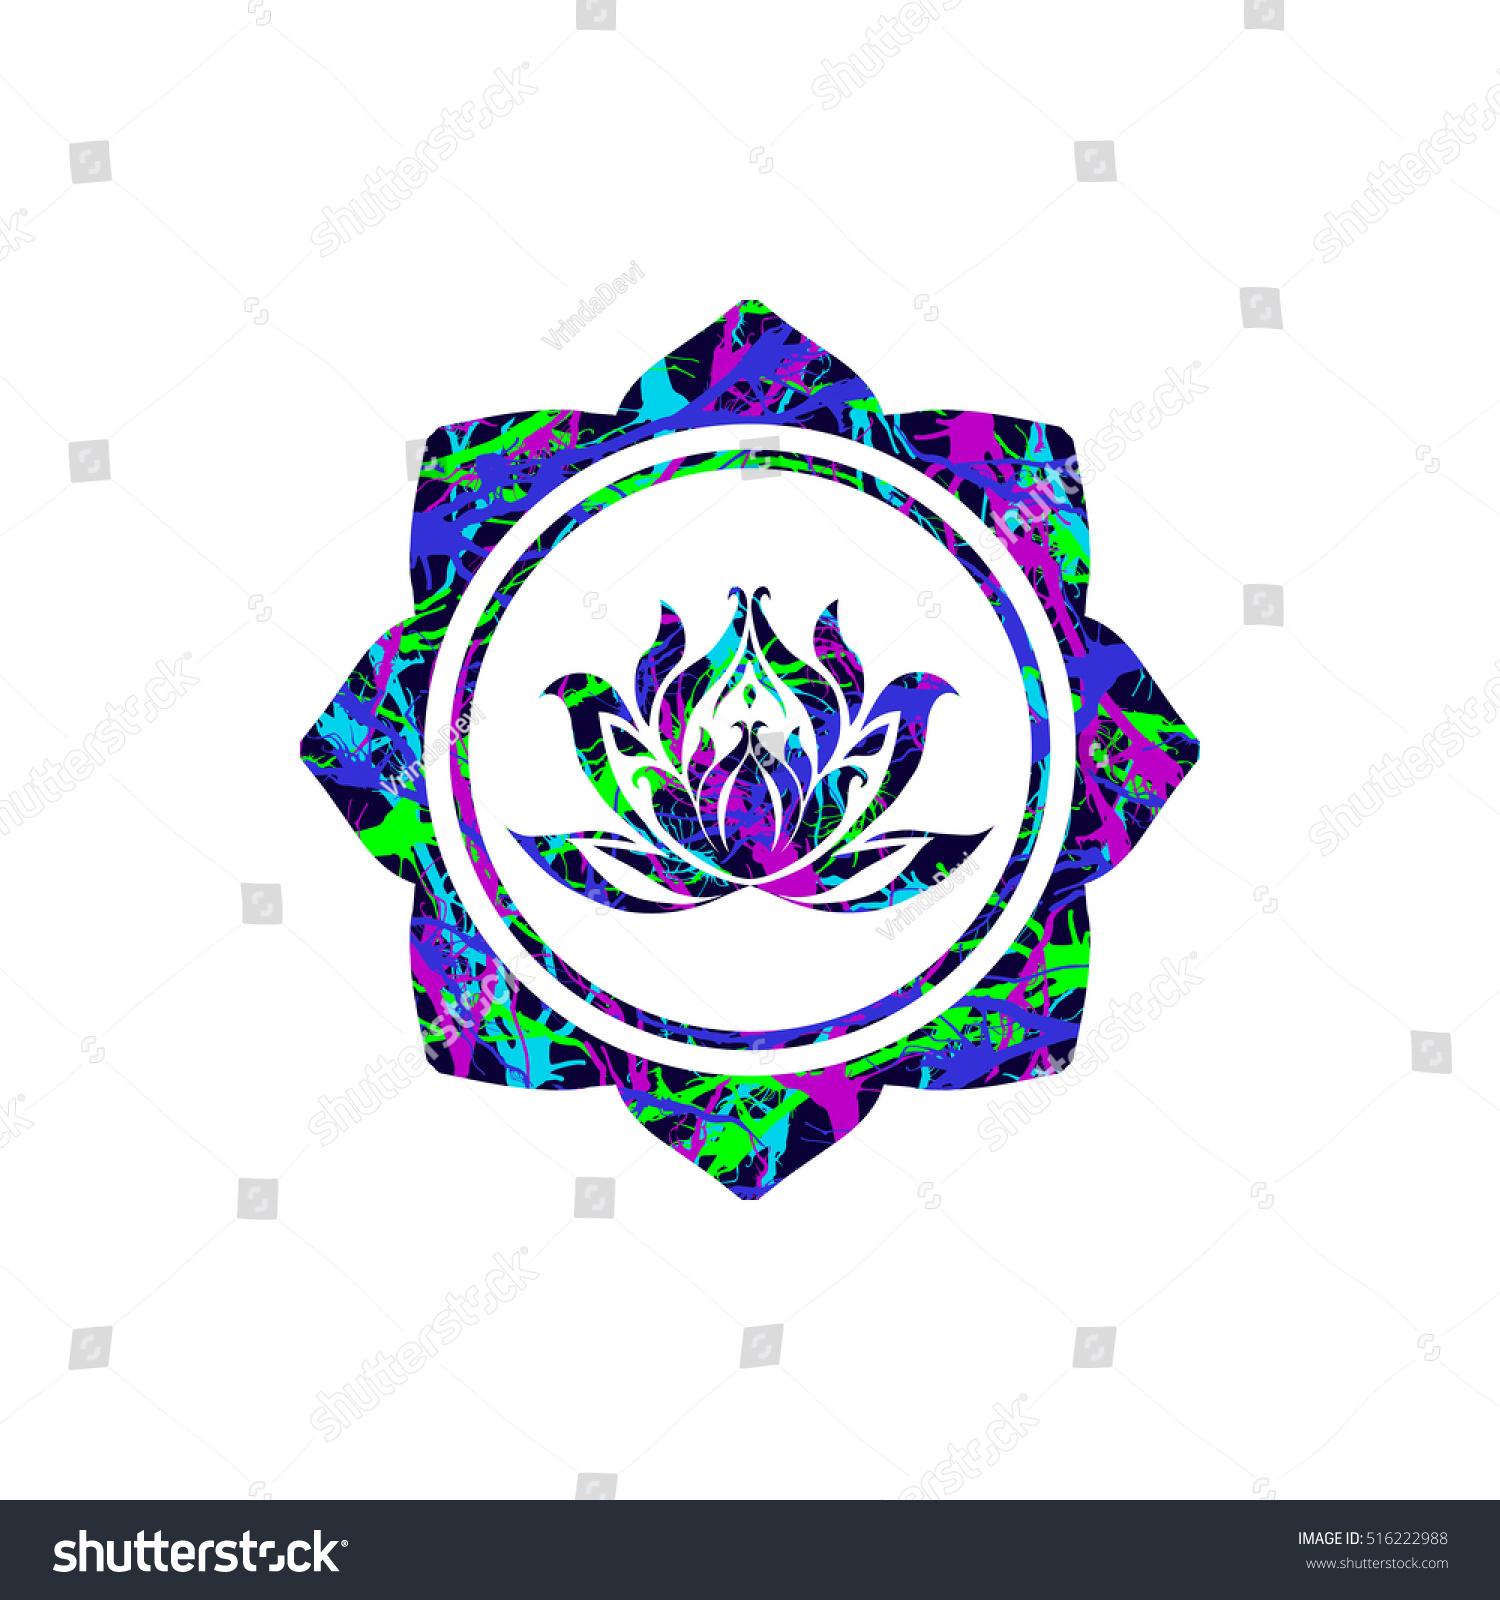 Royalty free lotus flower sign vector buddhist 516222988 stock lotus flower sign vector buddhist religious sacred symbol lotus illustration with oriental textured lotus mightylinksfo